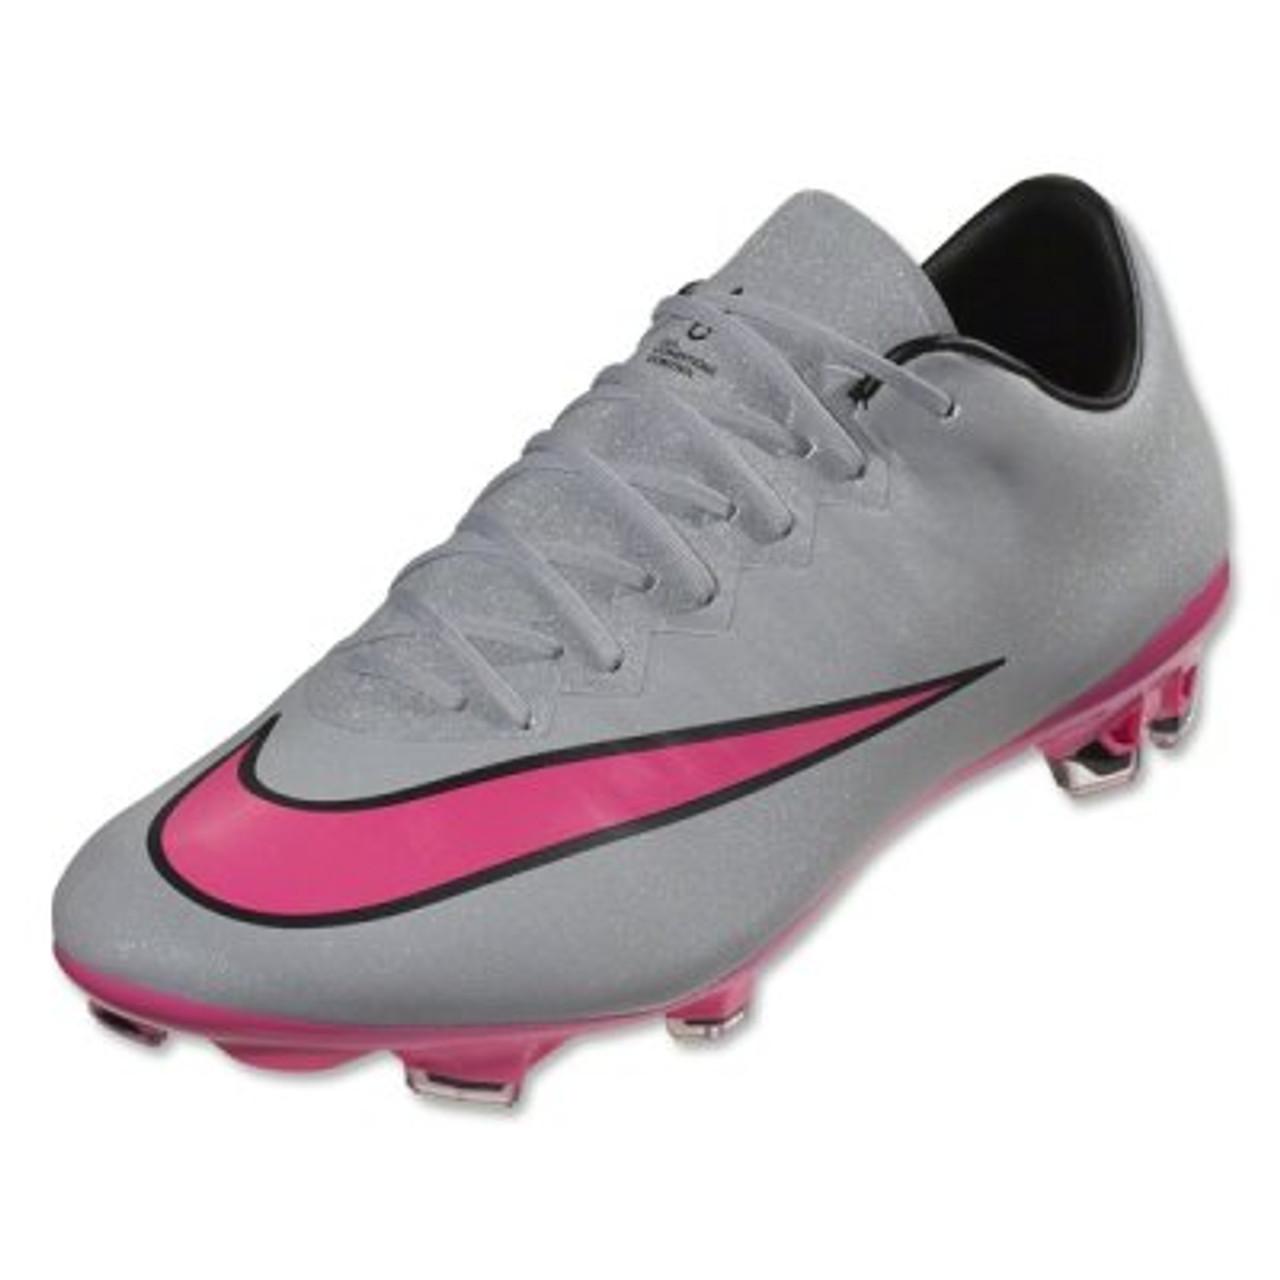 3bd049767 ... Nike Mercurial Vapor X FG - Wolf Grey/Black/Hyper Pink RC (042719. Sale